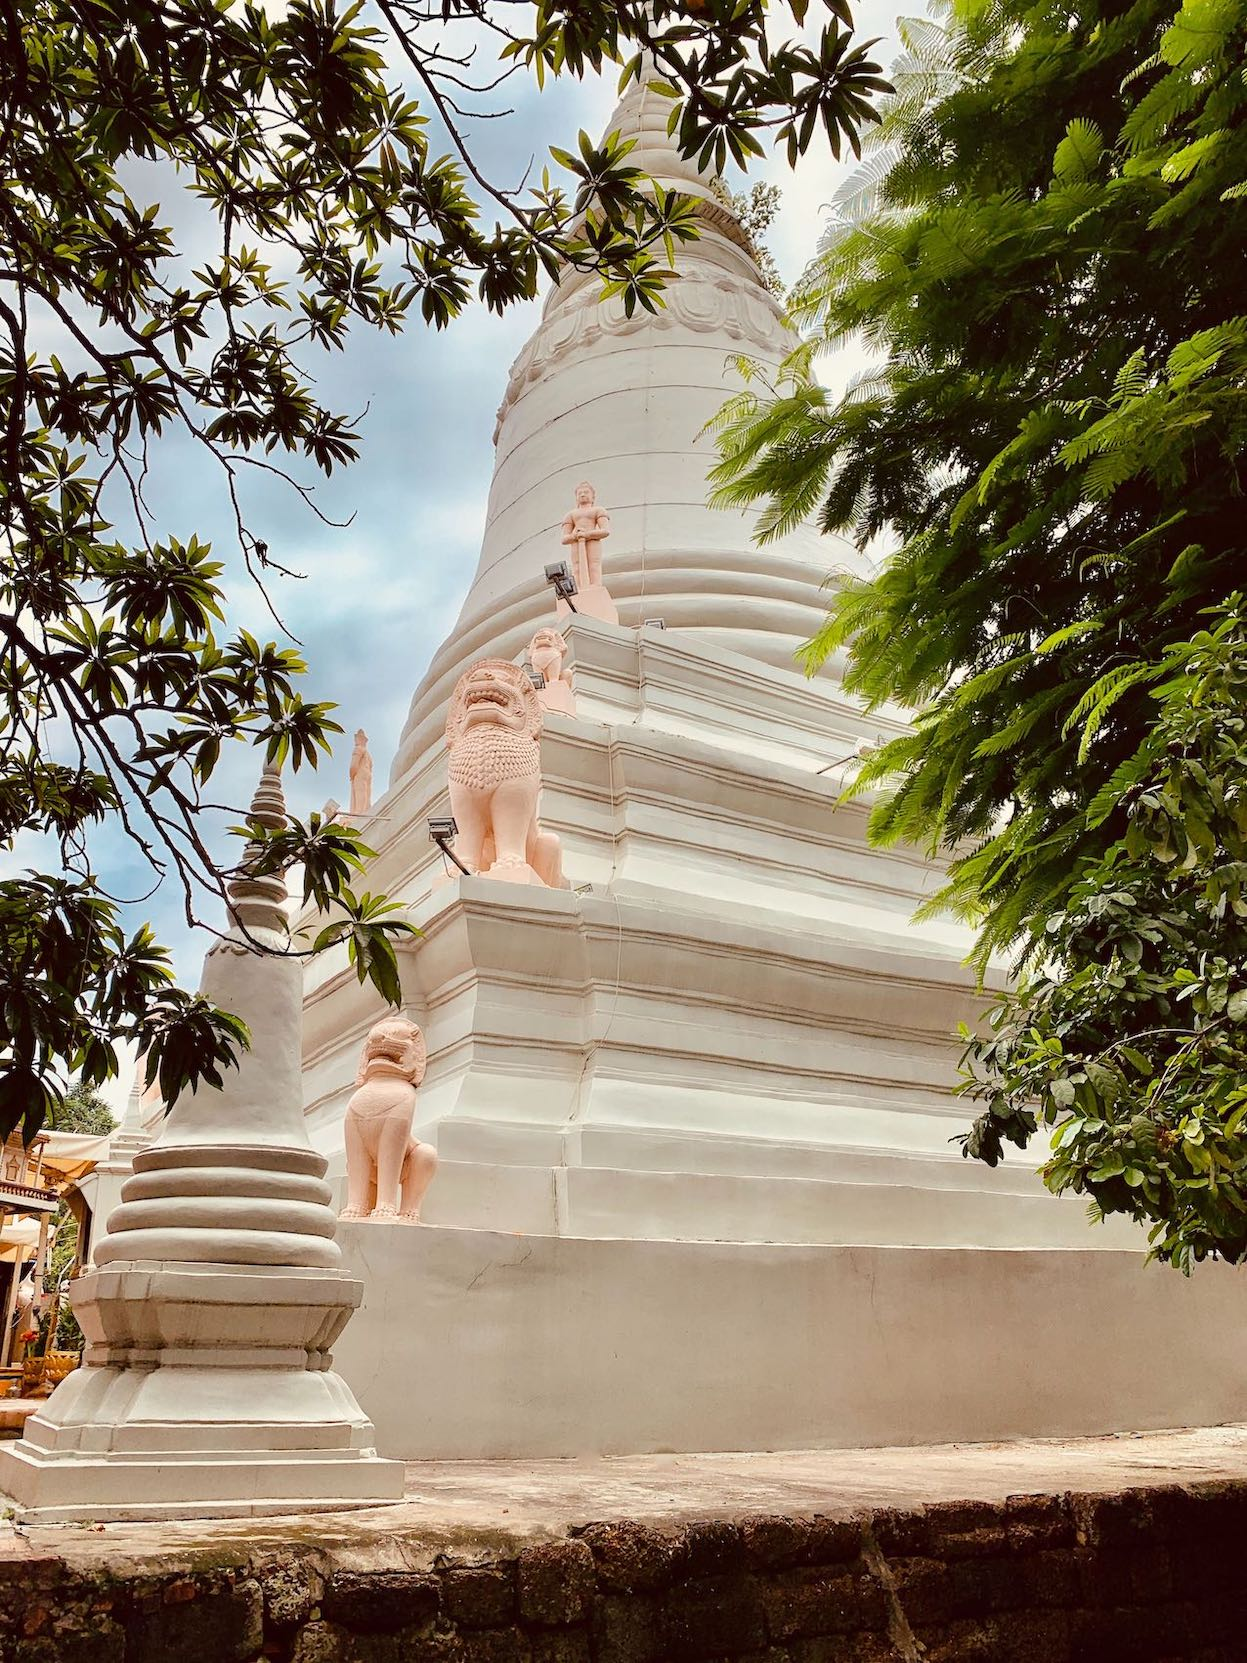 The main stupa at Wat Phnom Cambodia